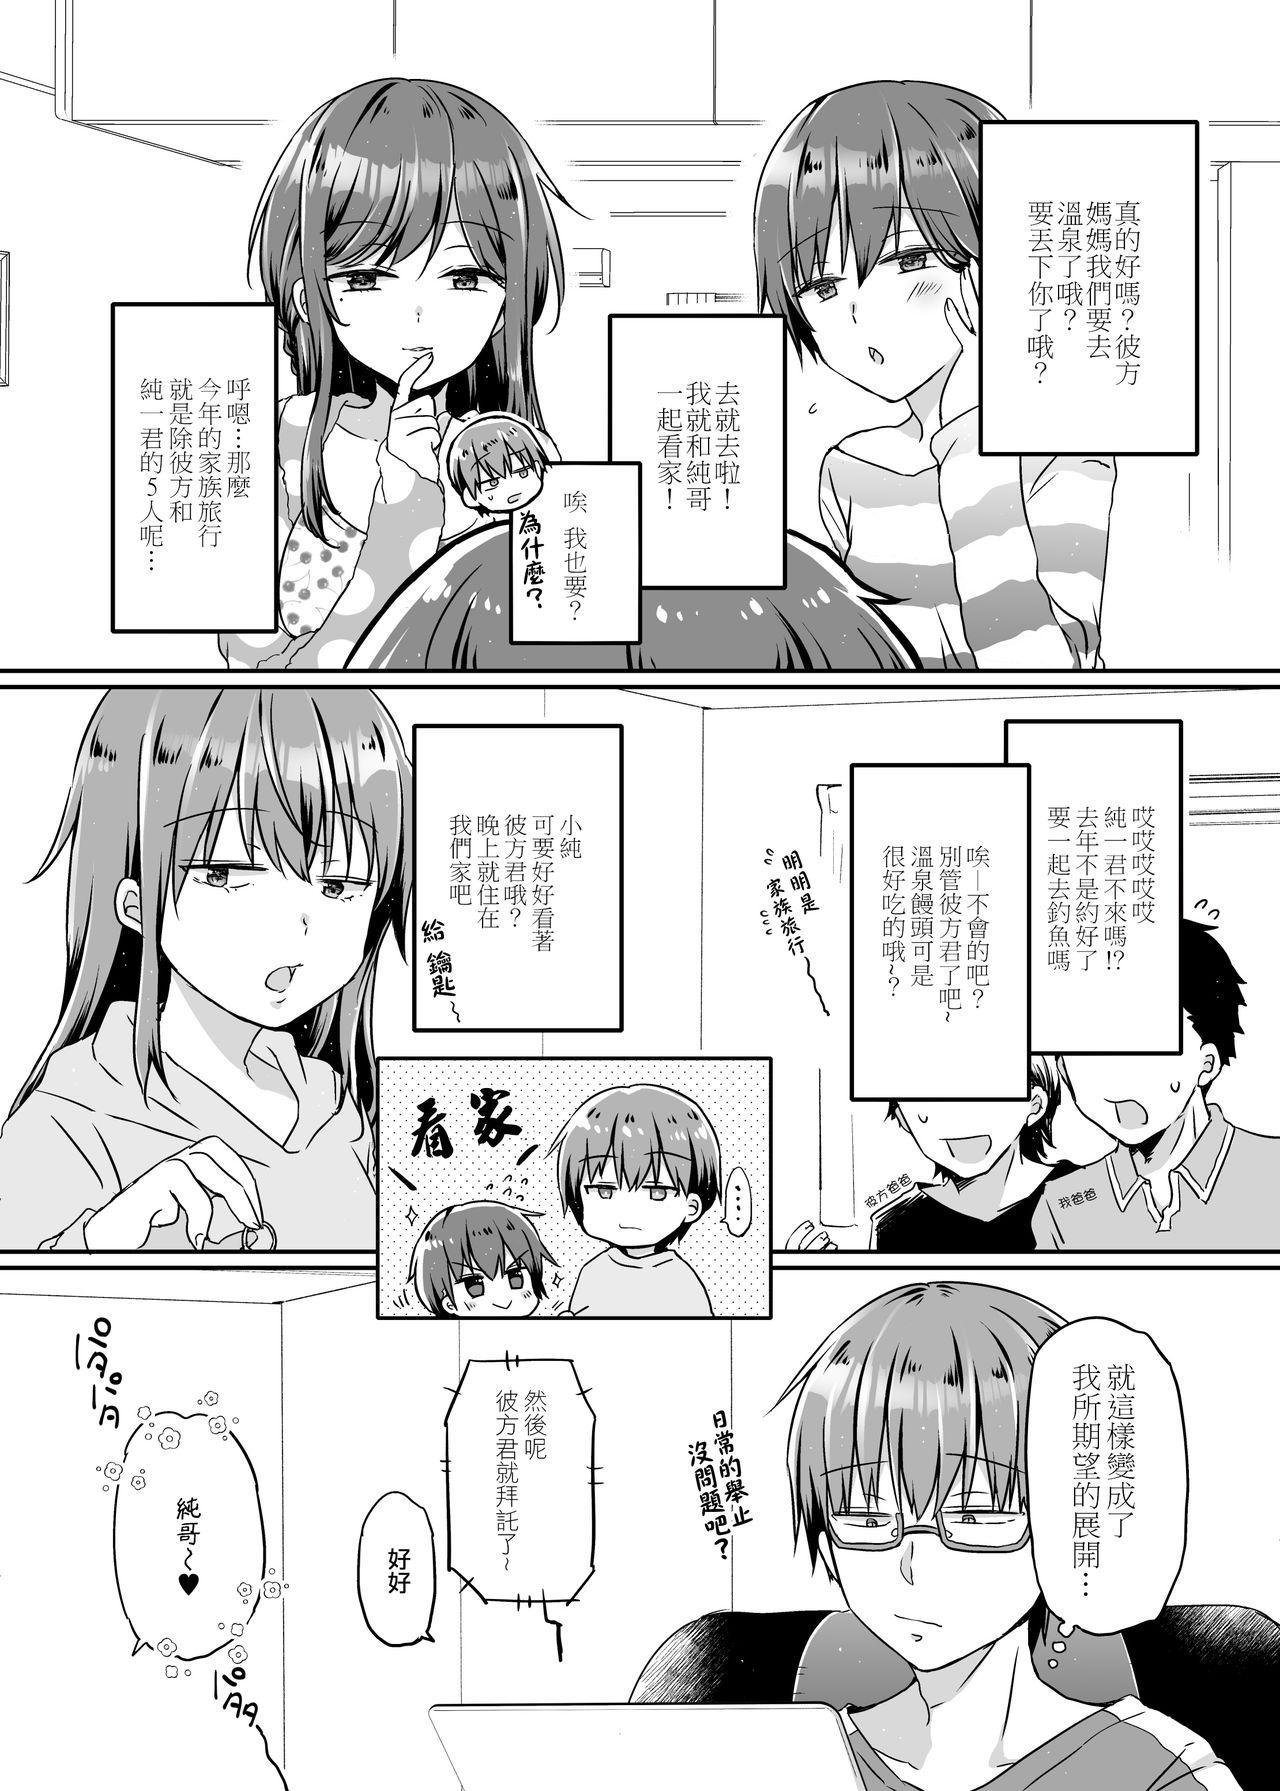 Totsugeki! Rinka no Josou Shounen 5 Ouchi de Mizugi Hen 15